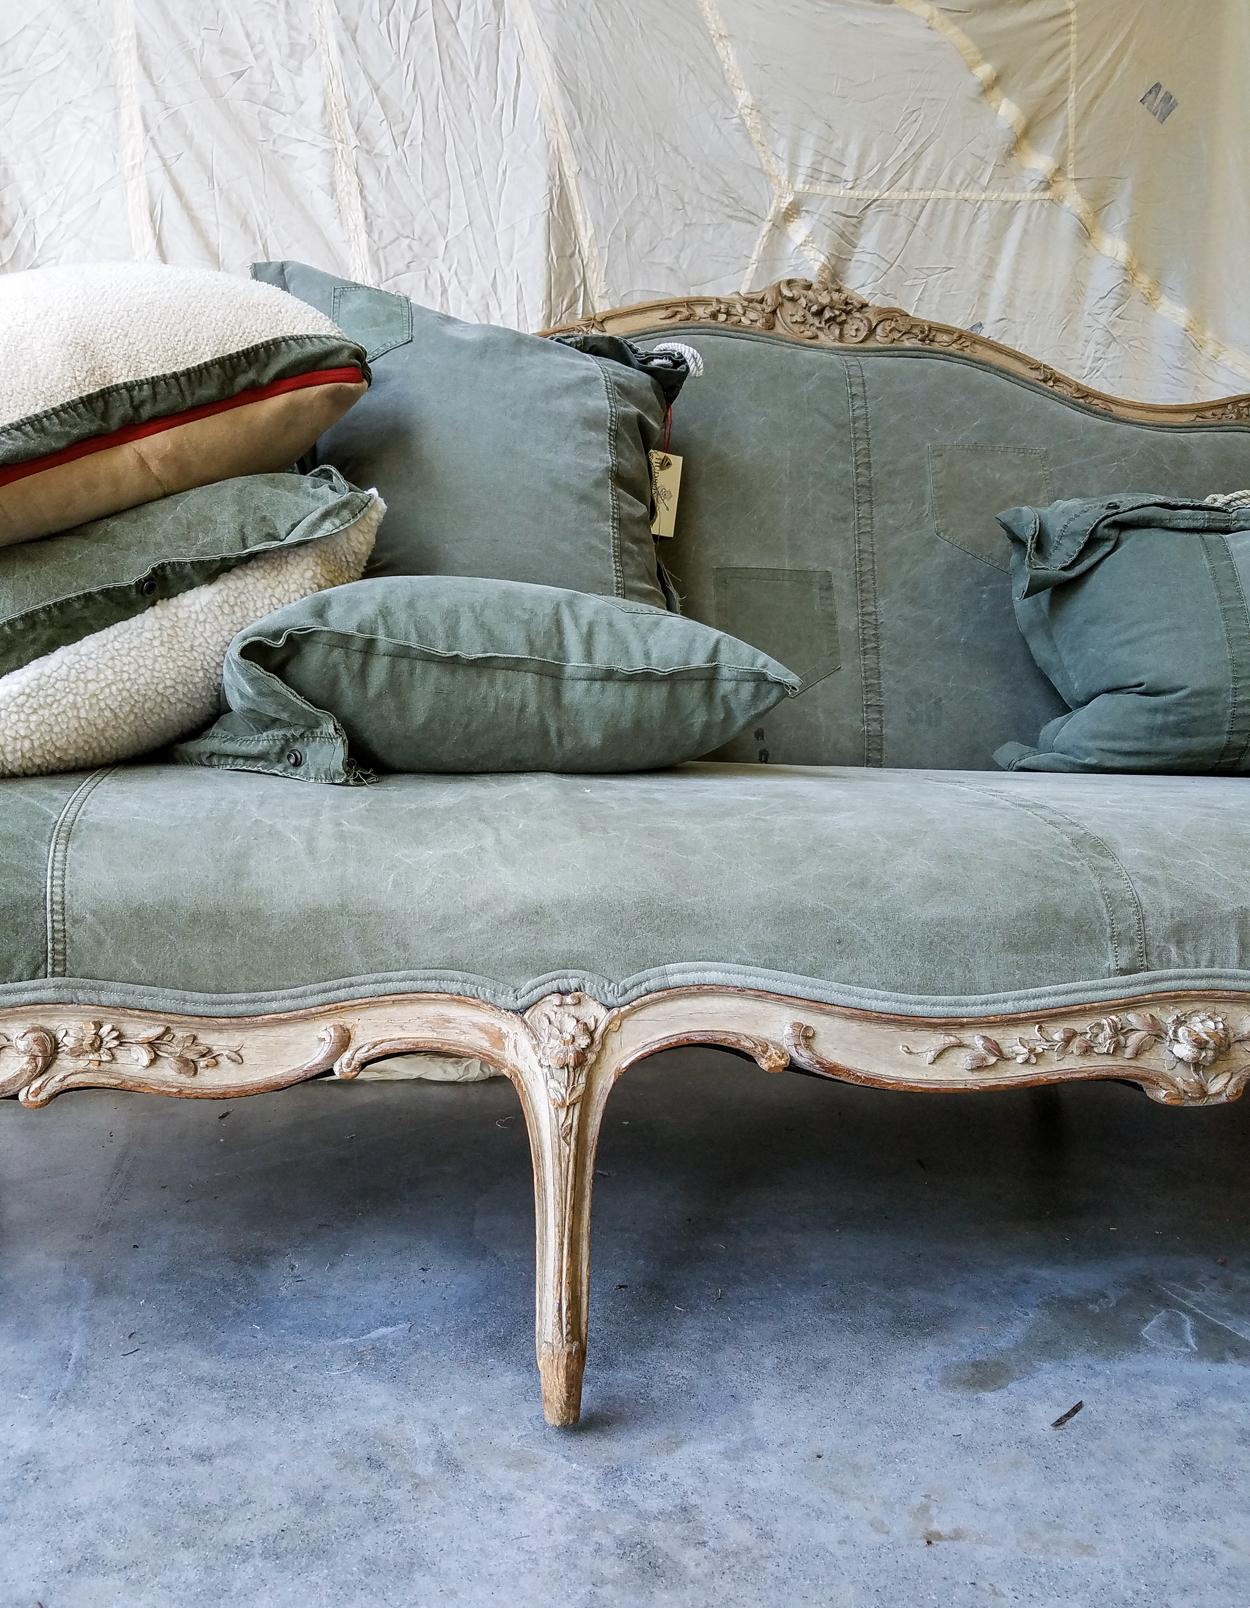 Surplus couch leg detial_sm.jpg